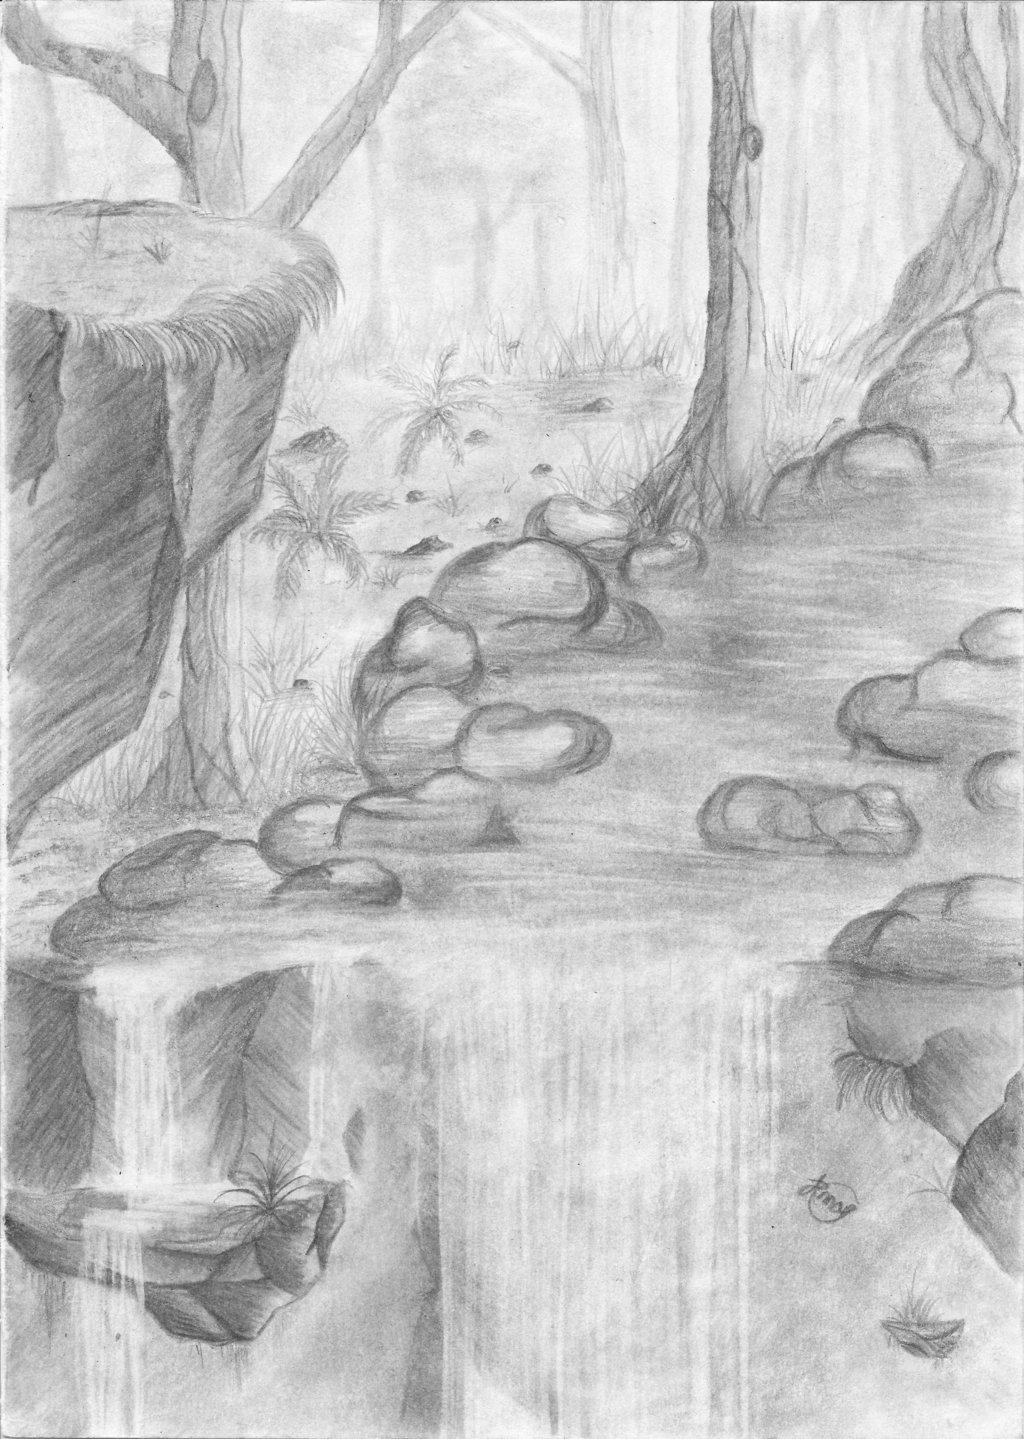 Drawn still life nature  Drawings Of Pencil Art